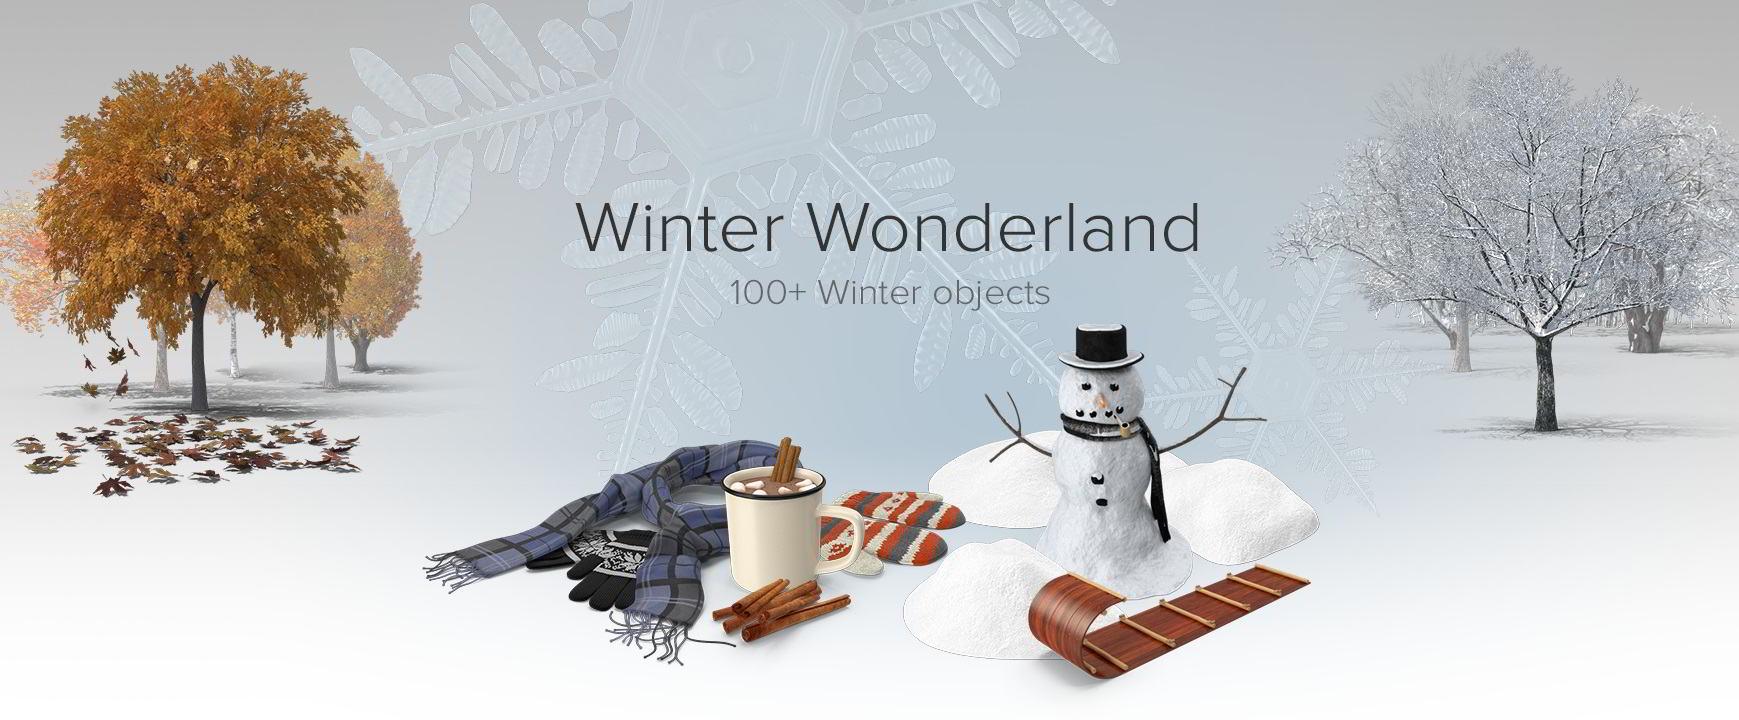 PixelSquid – Winter Wonderland Collection free download